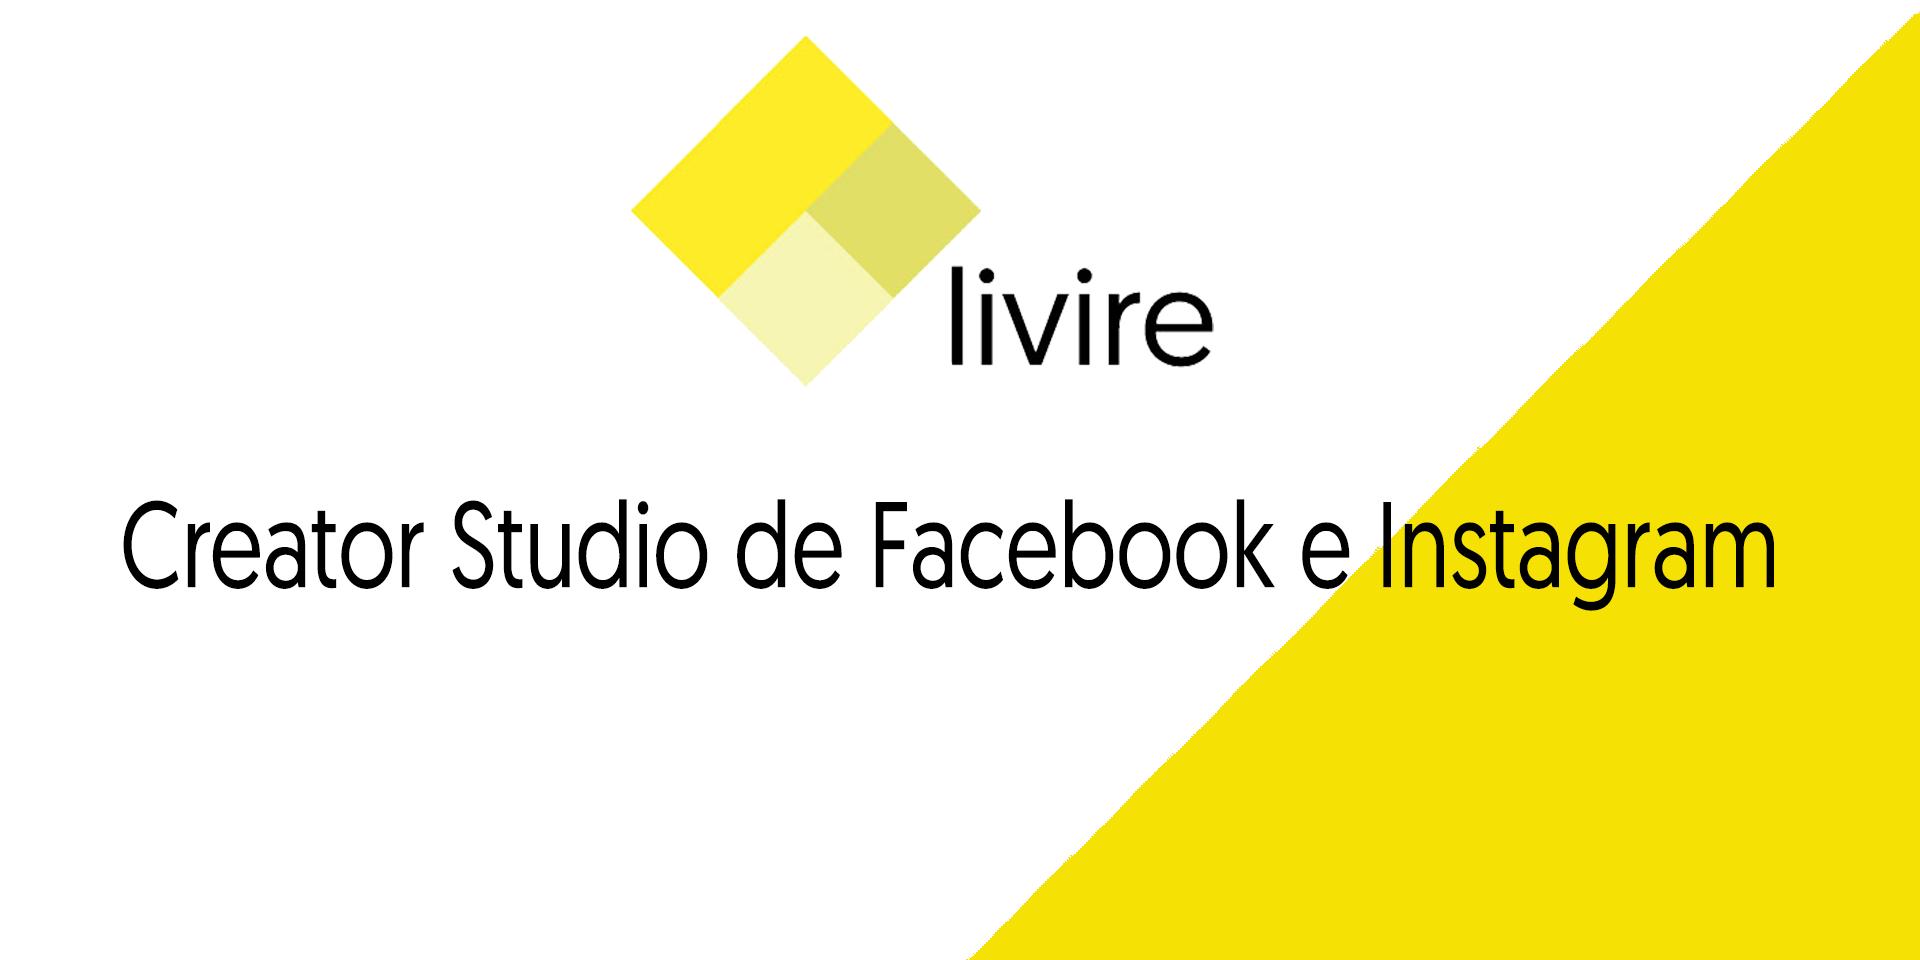 Creator Studio de Facebook e Instagram